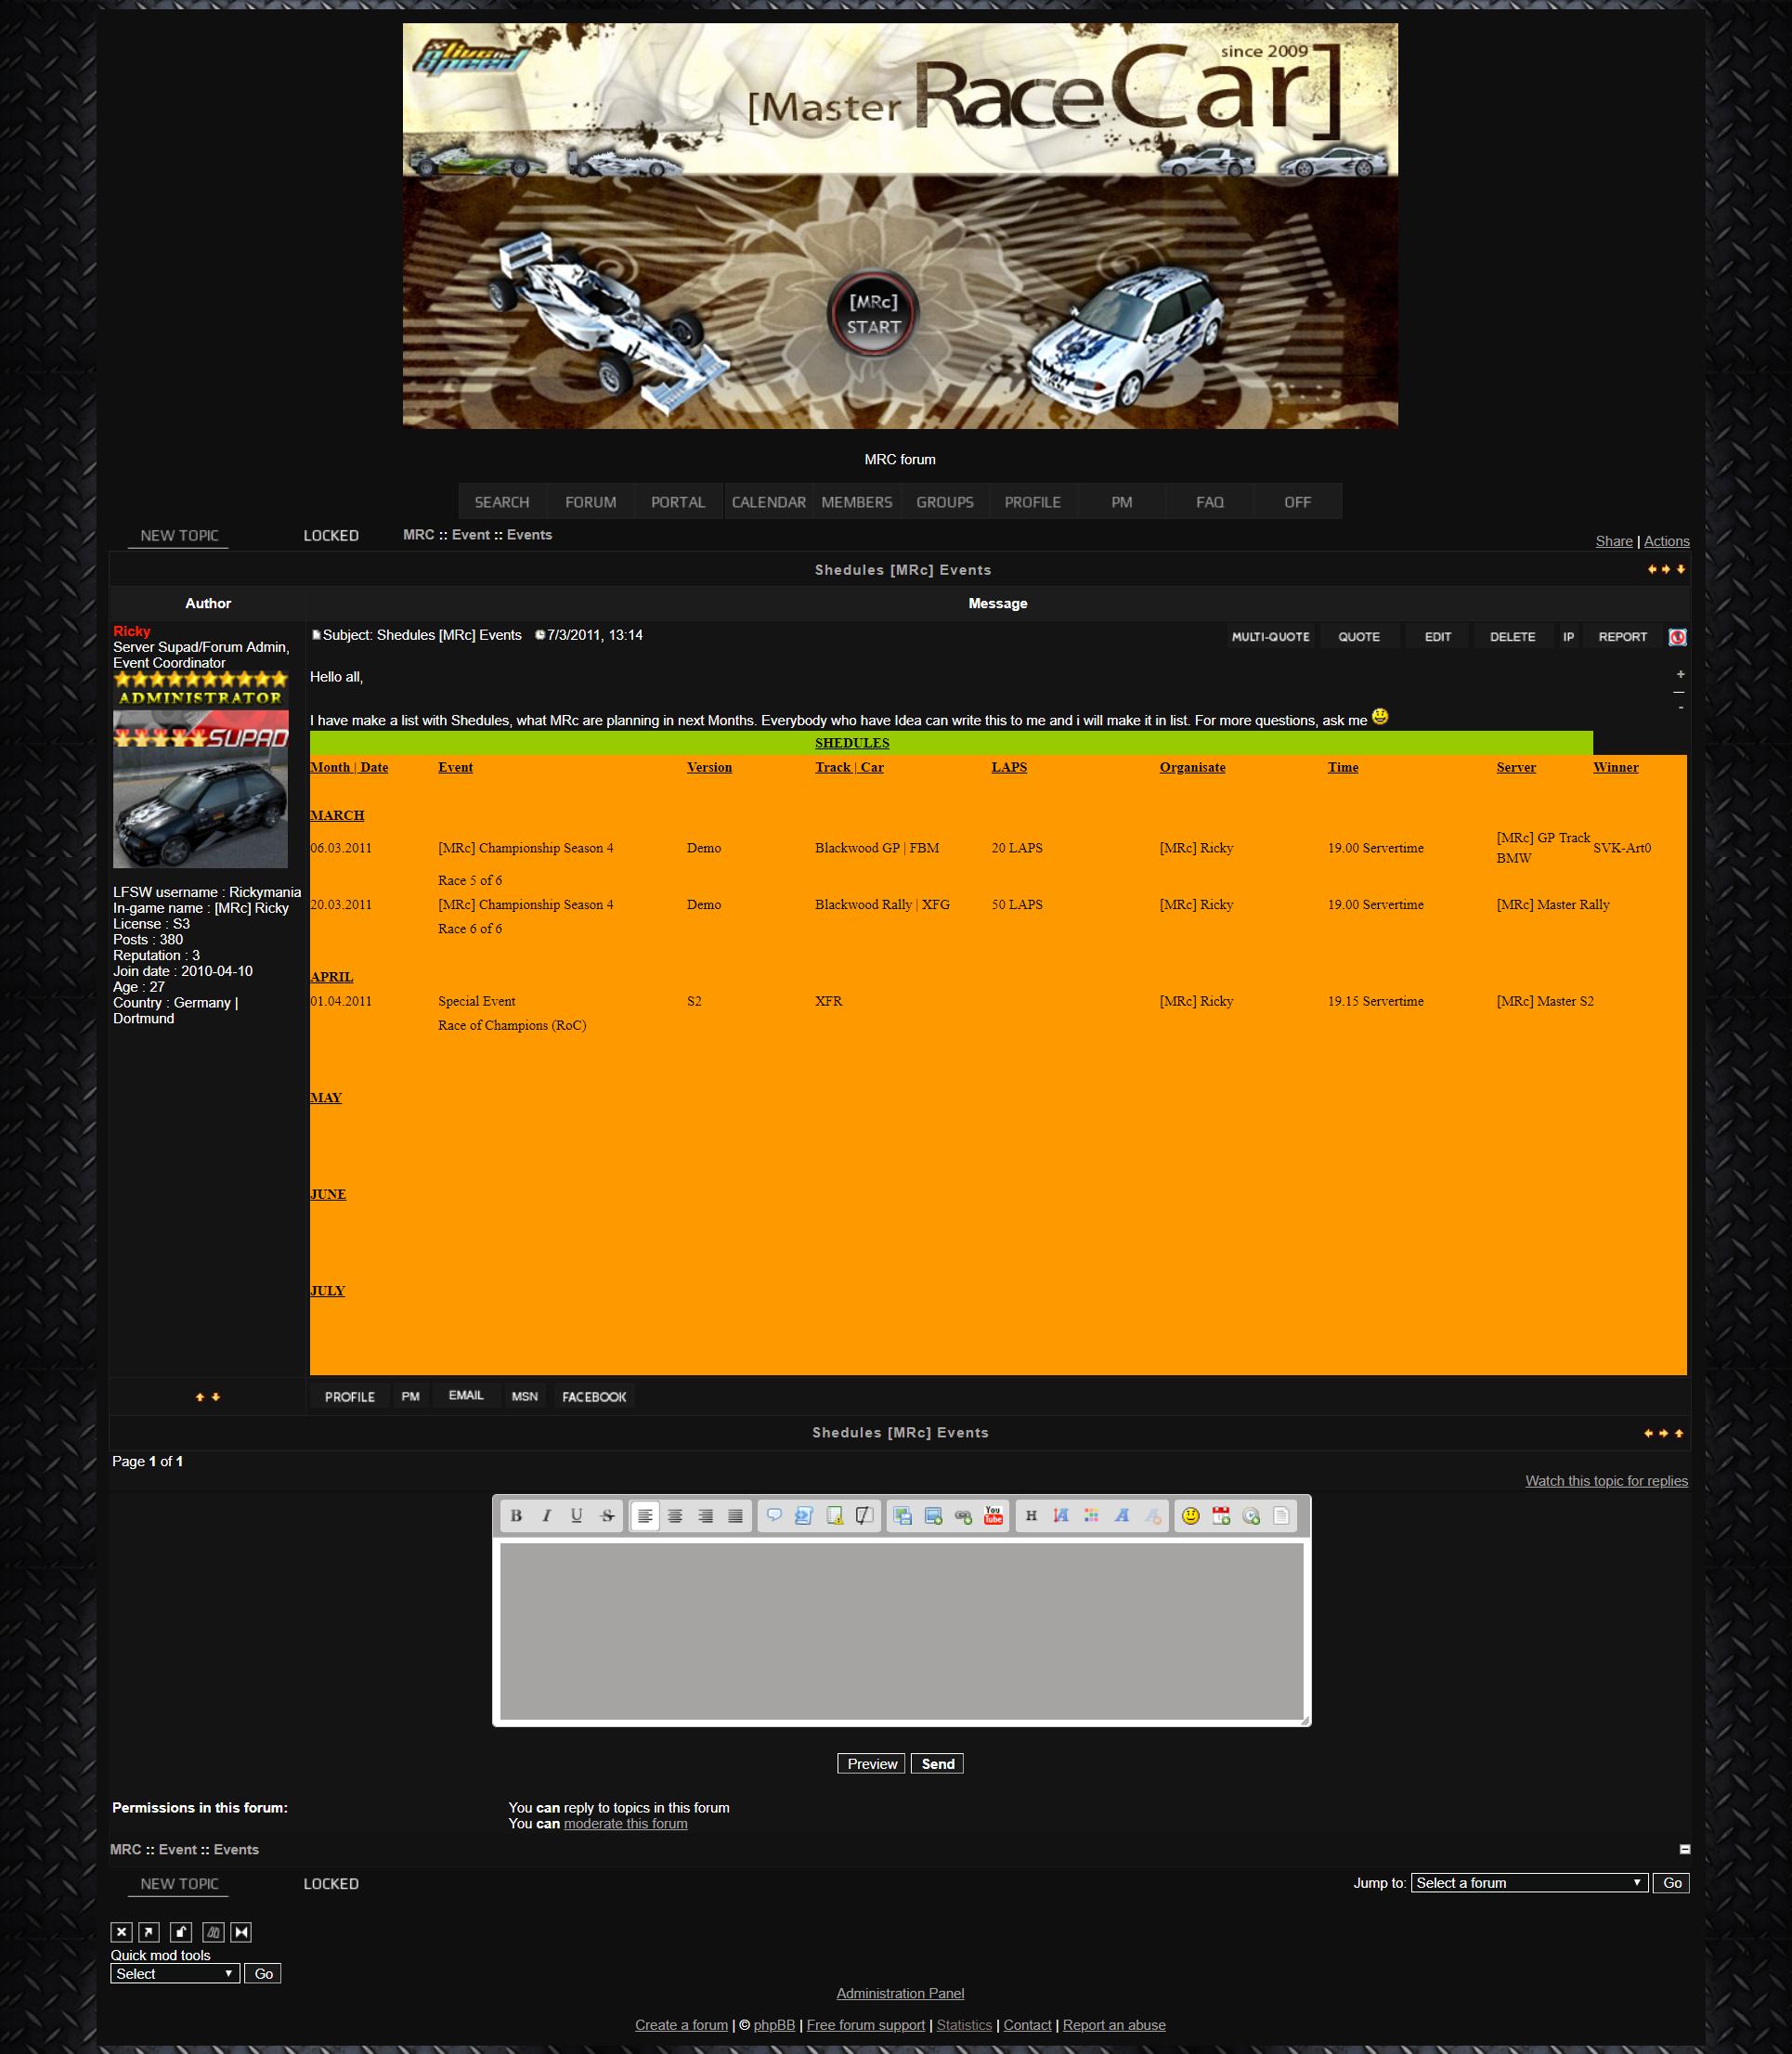 [Image: screencapture-masterracecar-forumactif-t...-54-26.jpg]